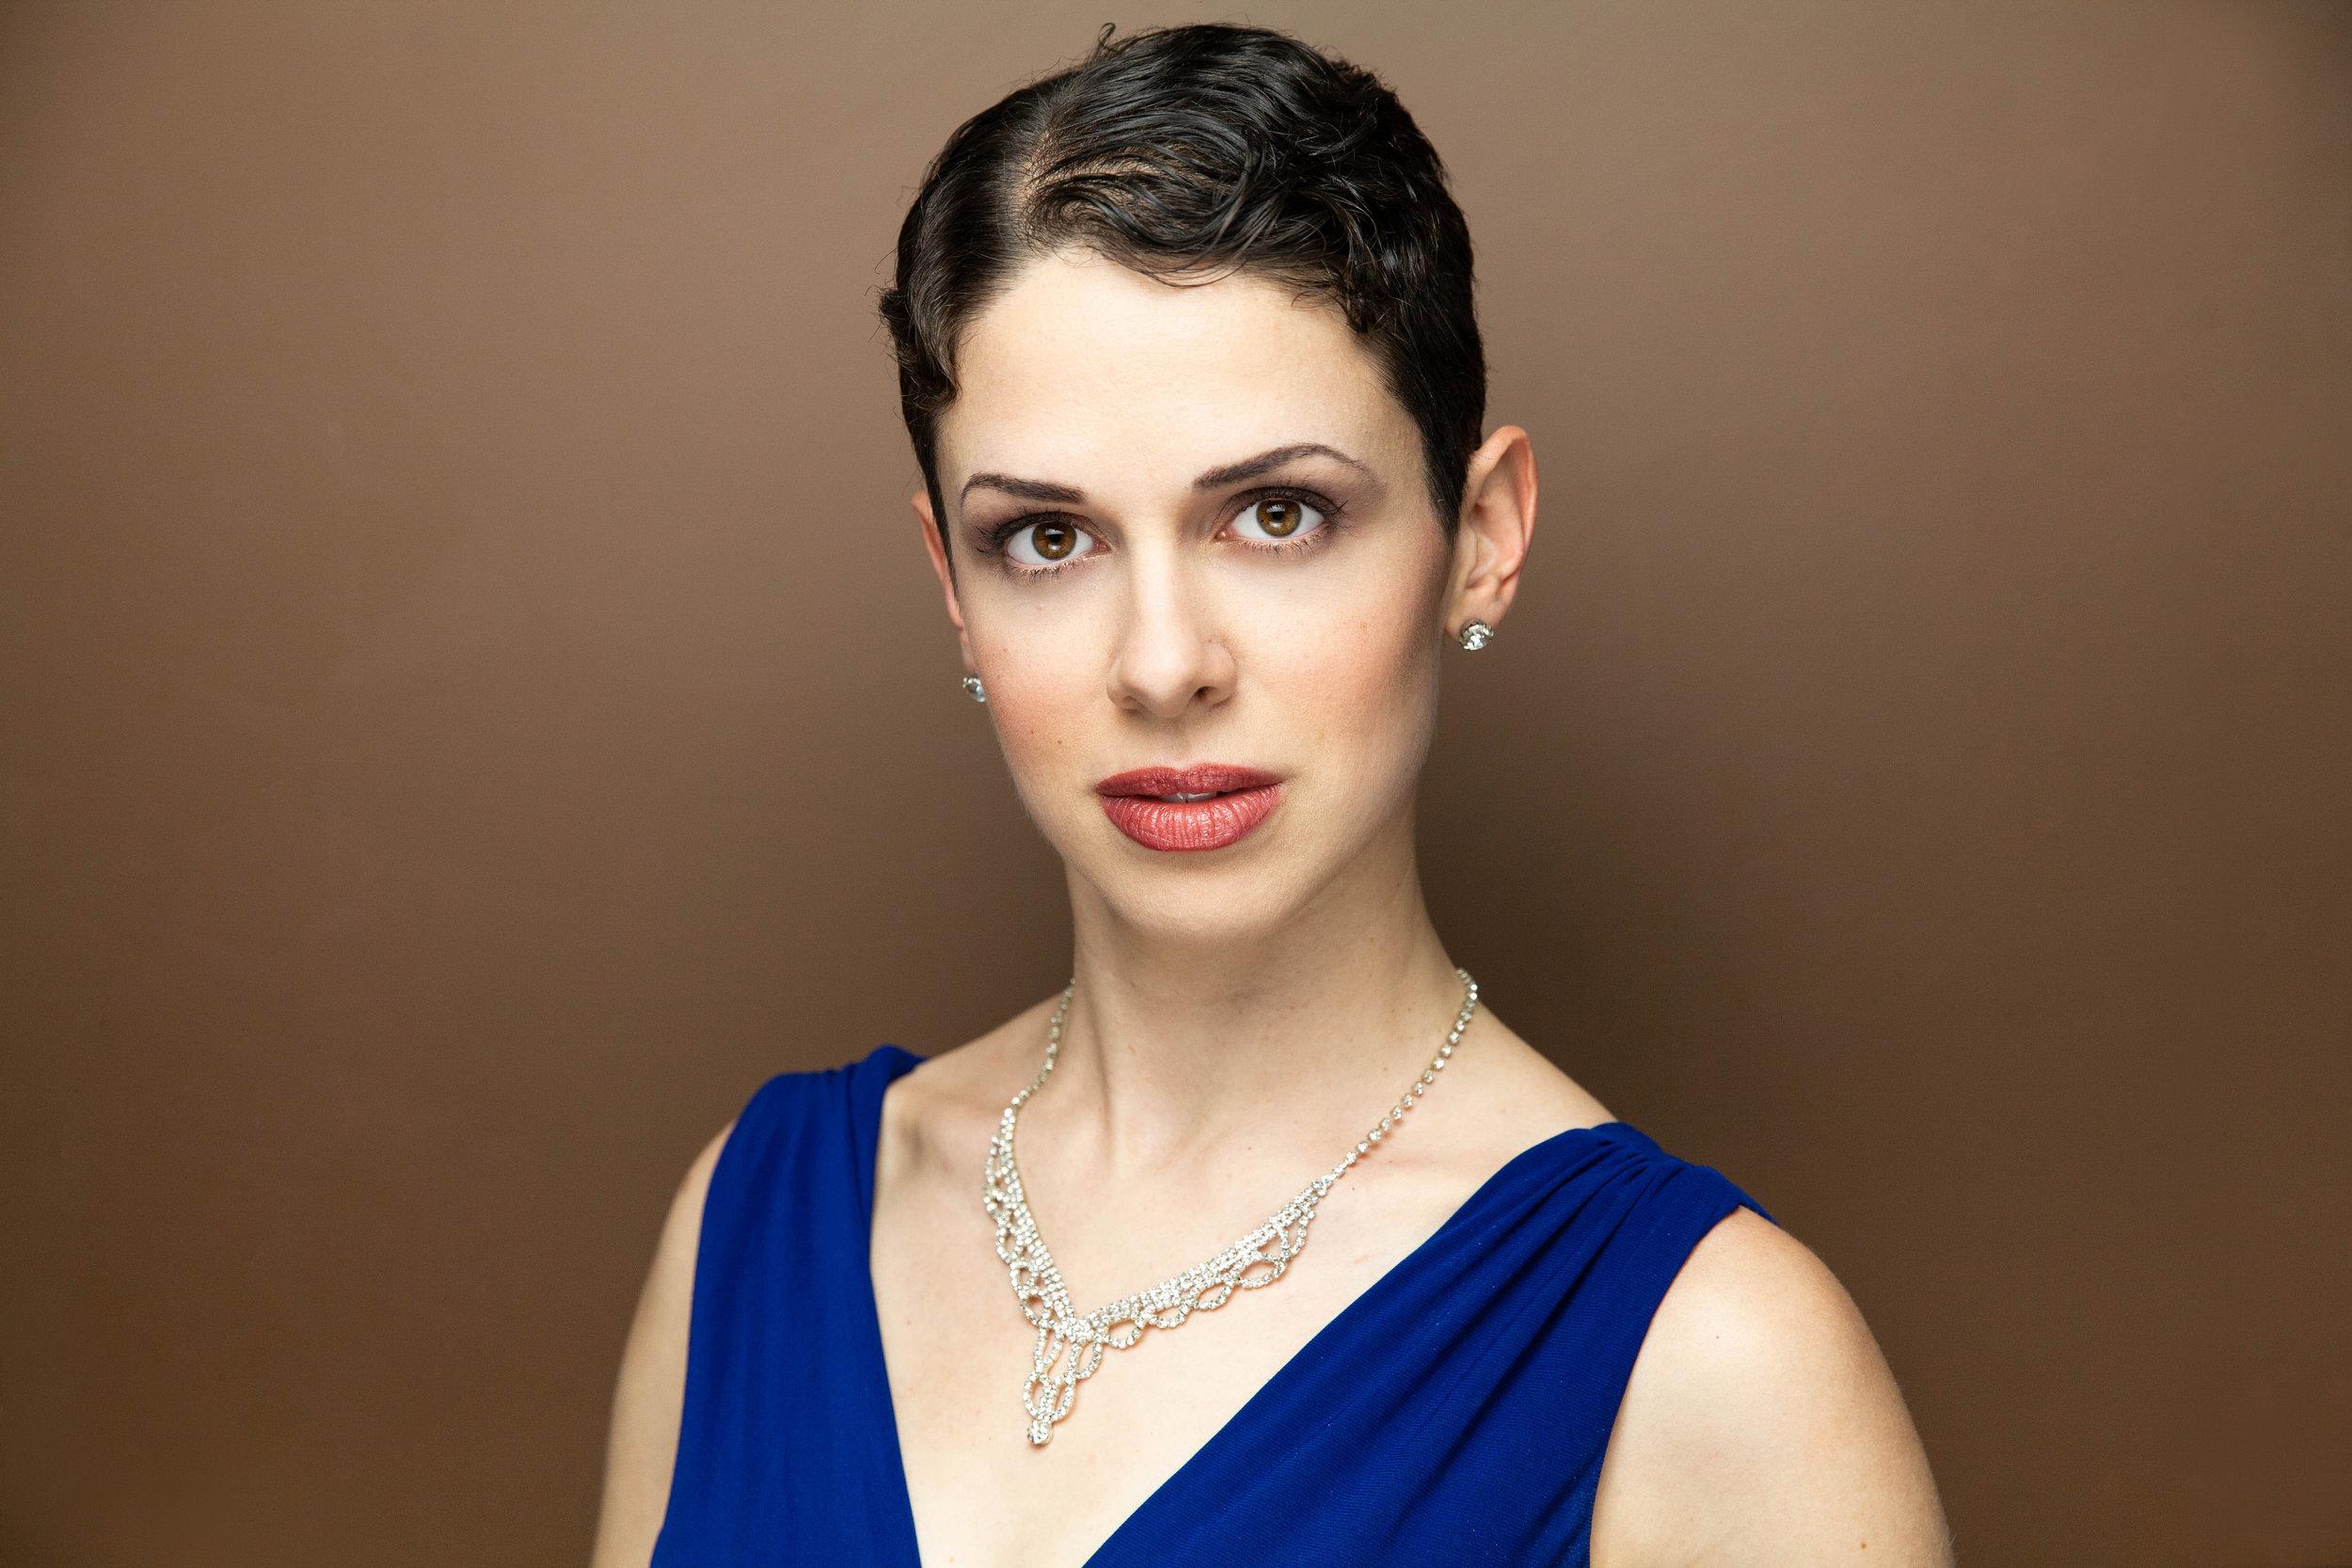 Kinneret Ely Traviata headshot.jpg